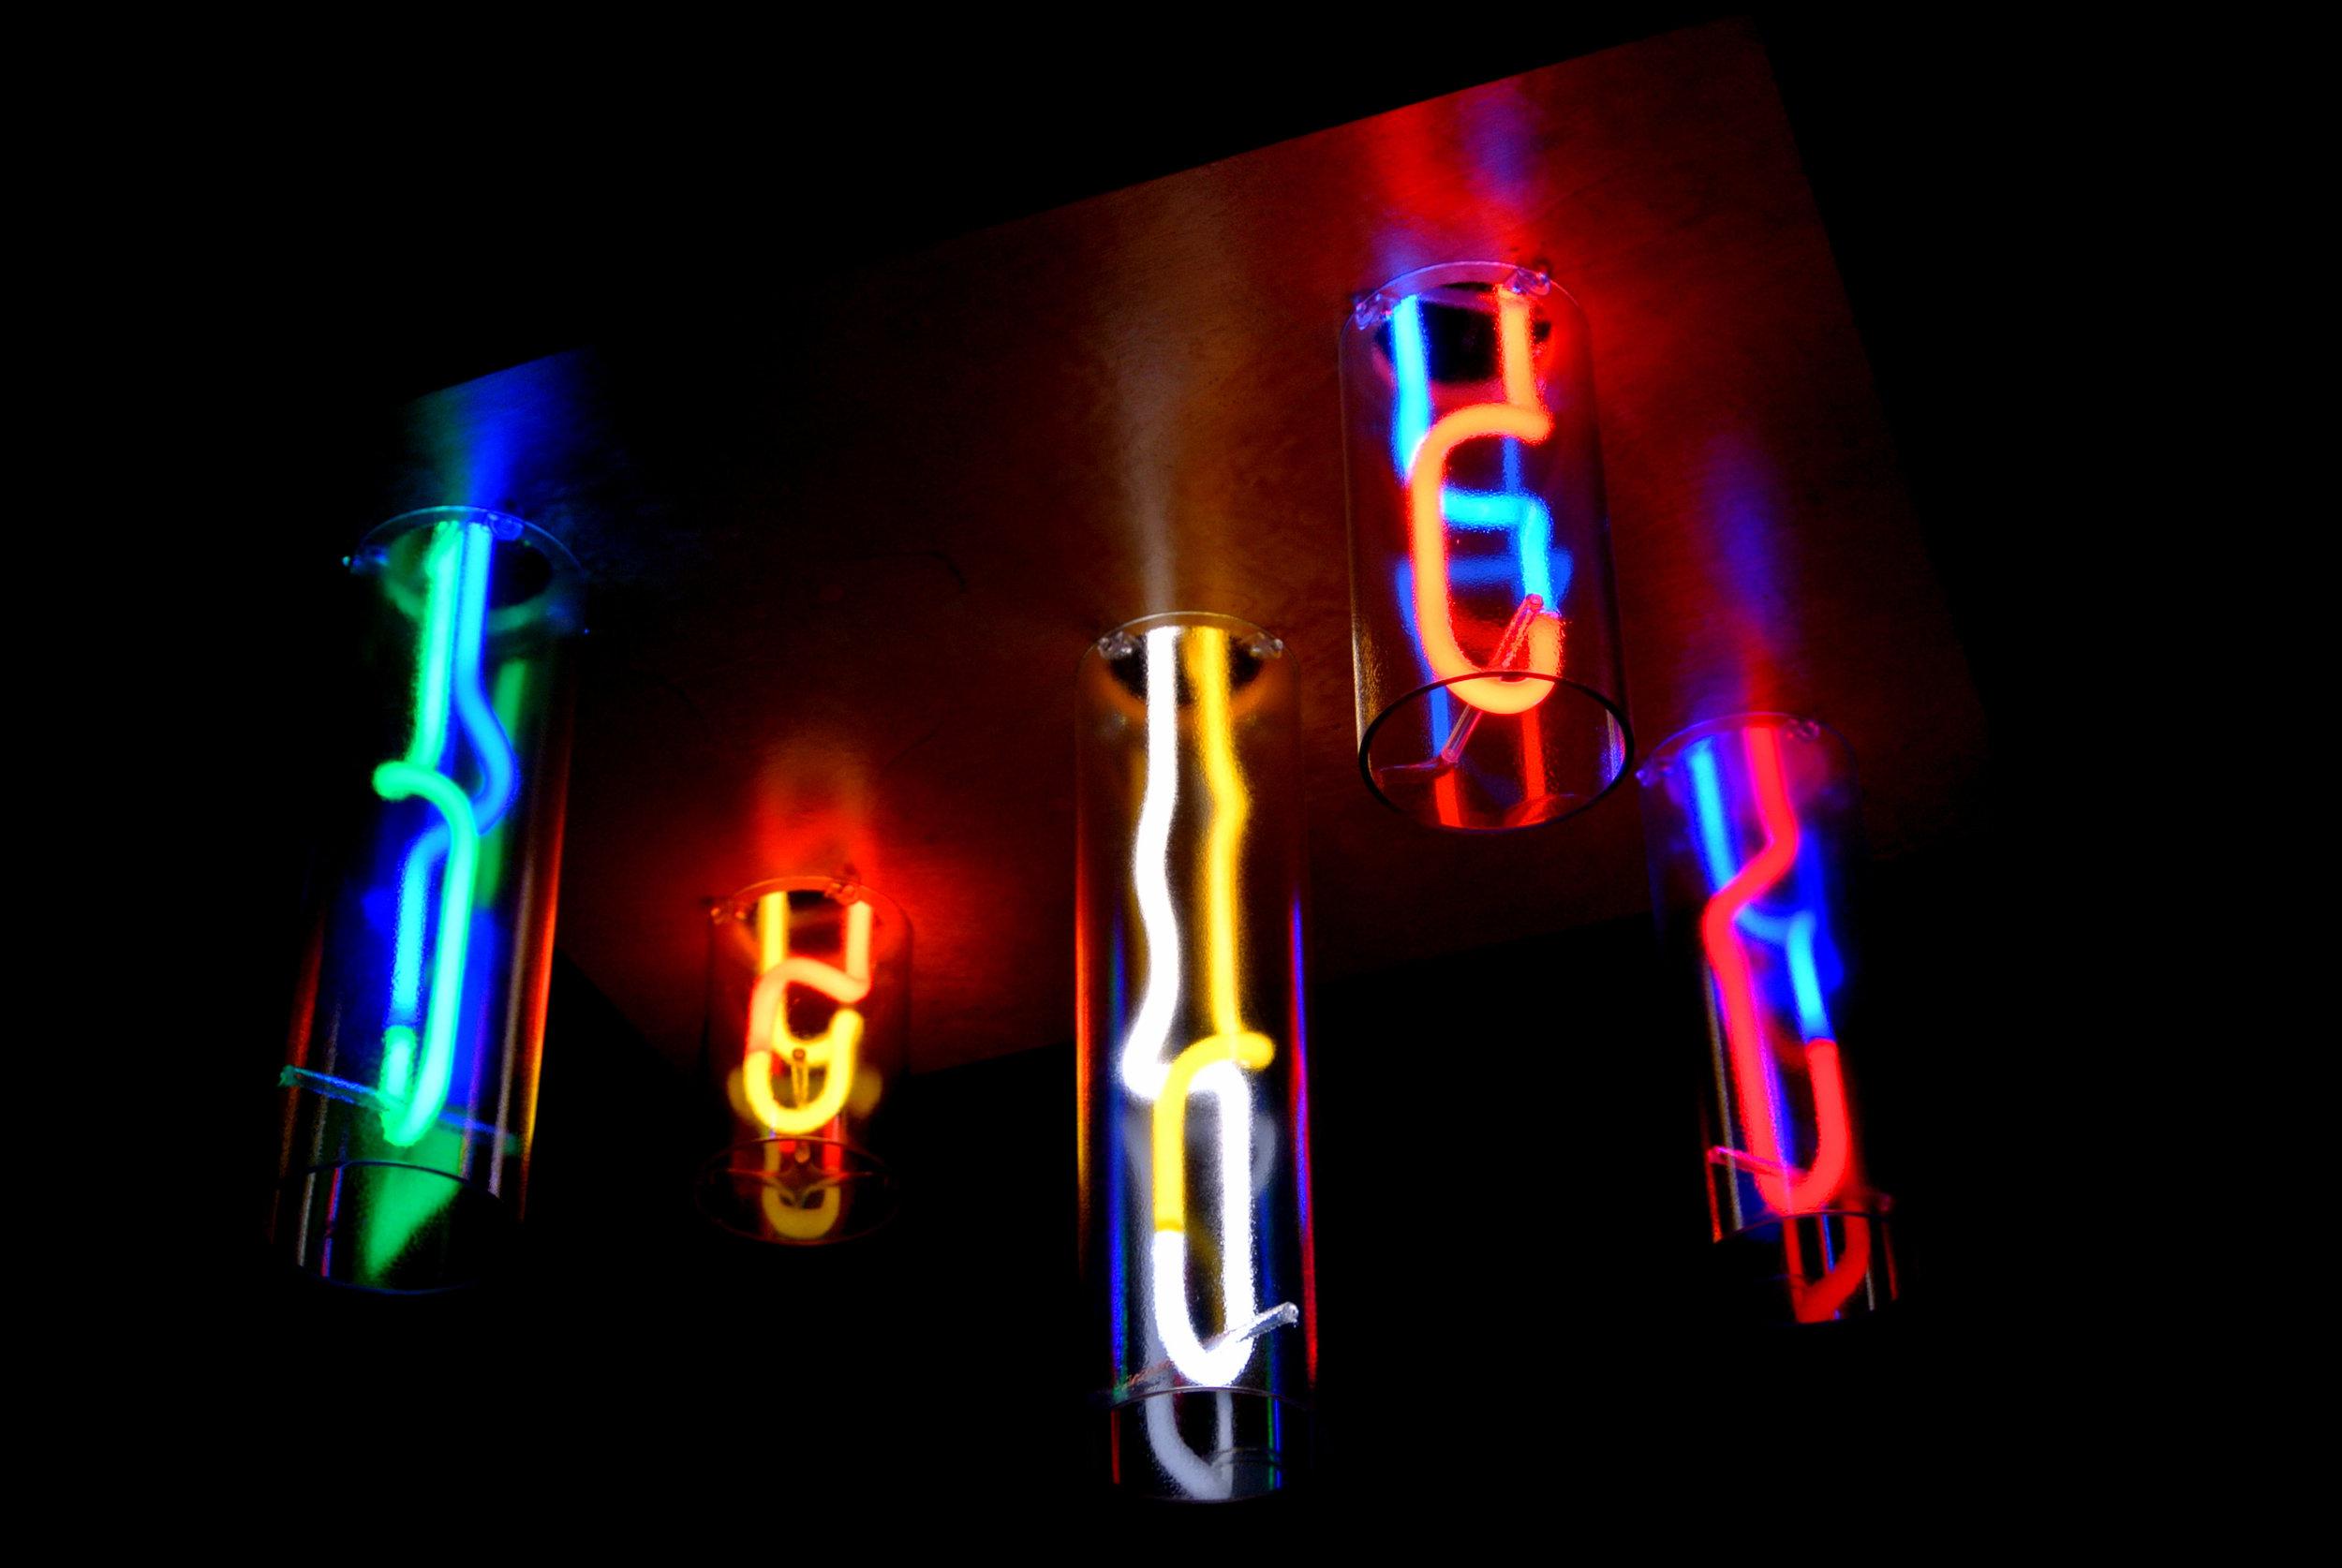 DESIGNER NEON LIGHTING by John Barton - BartonNeonMagic.com